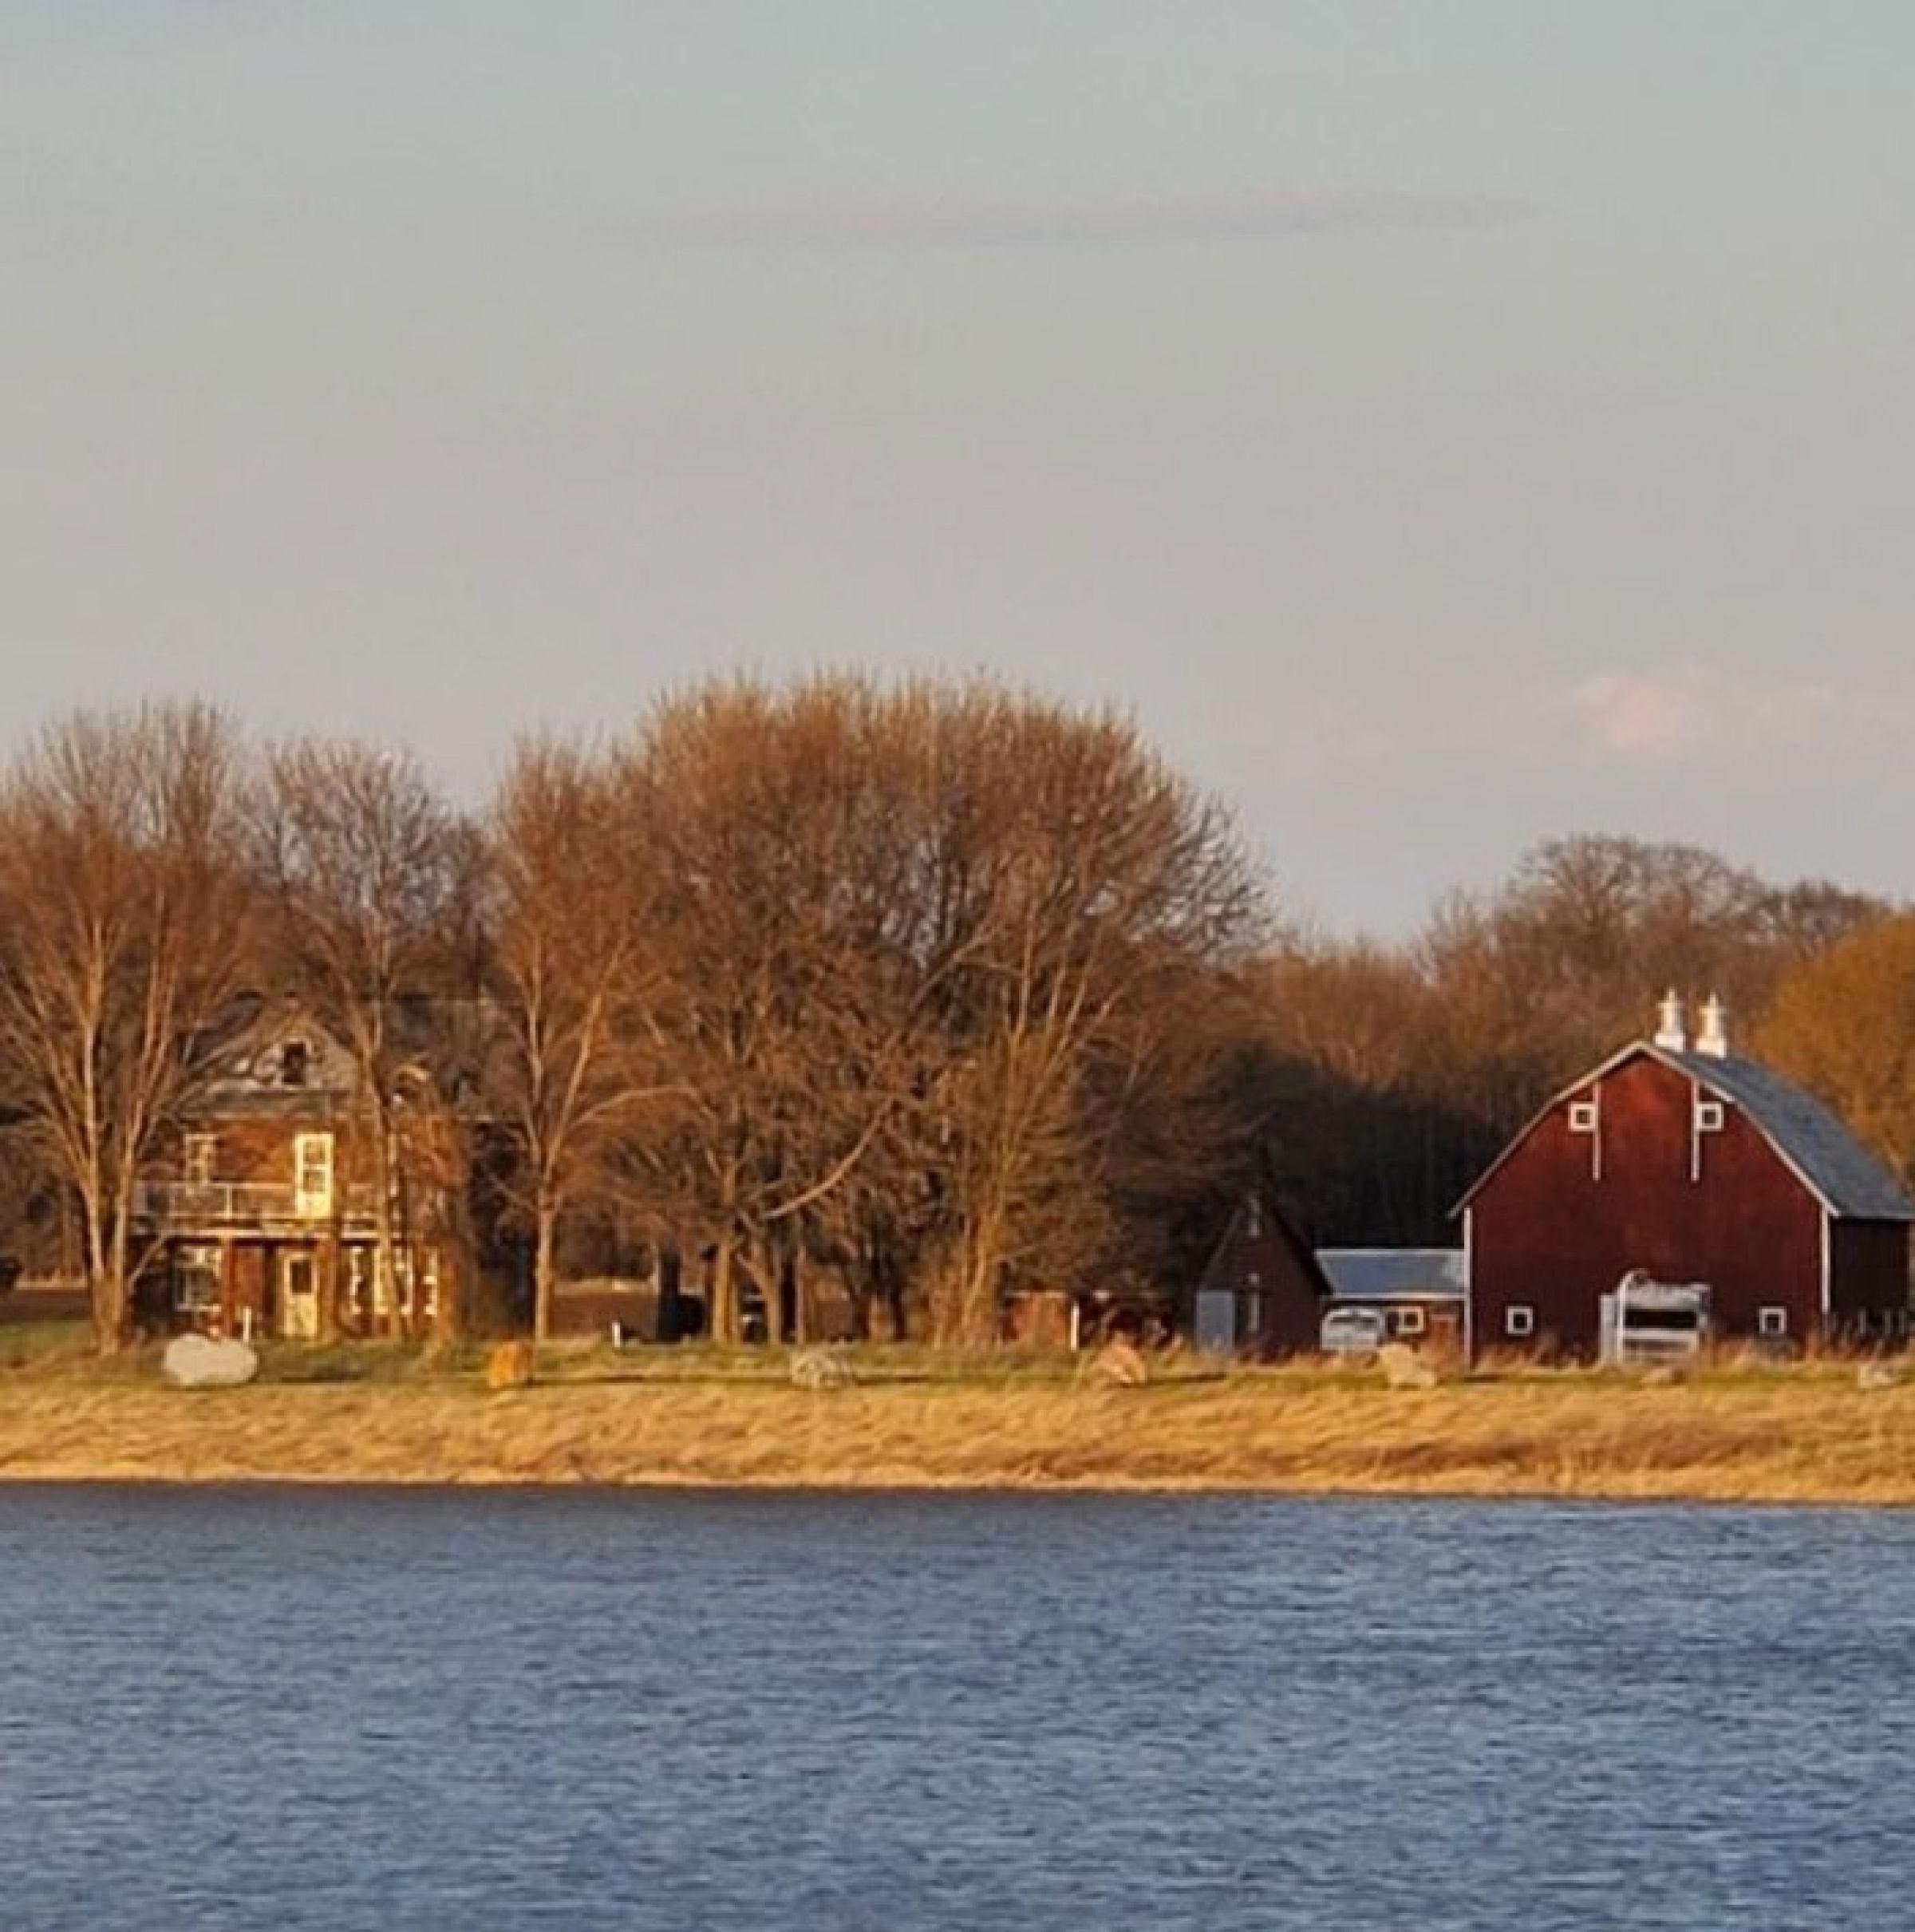 residential-land-mcleod-county-minnesota-80-acres-listing-number-15182-6-2020-09-23-163826.jpeg